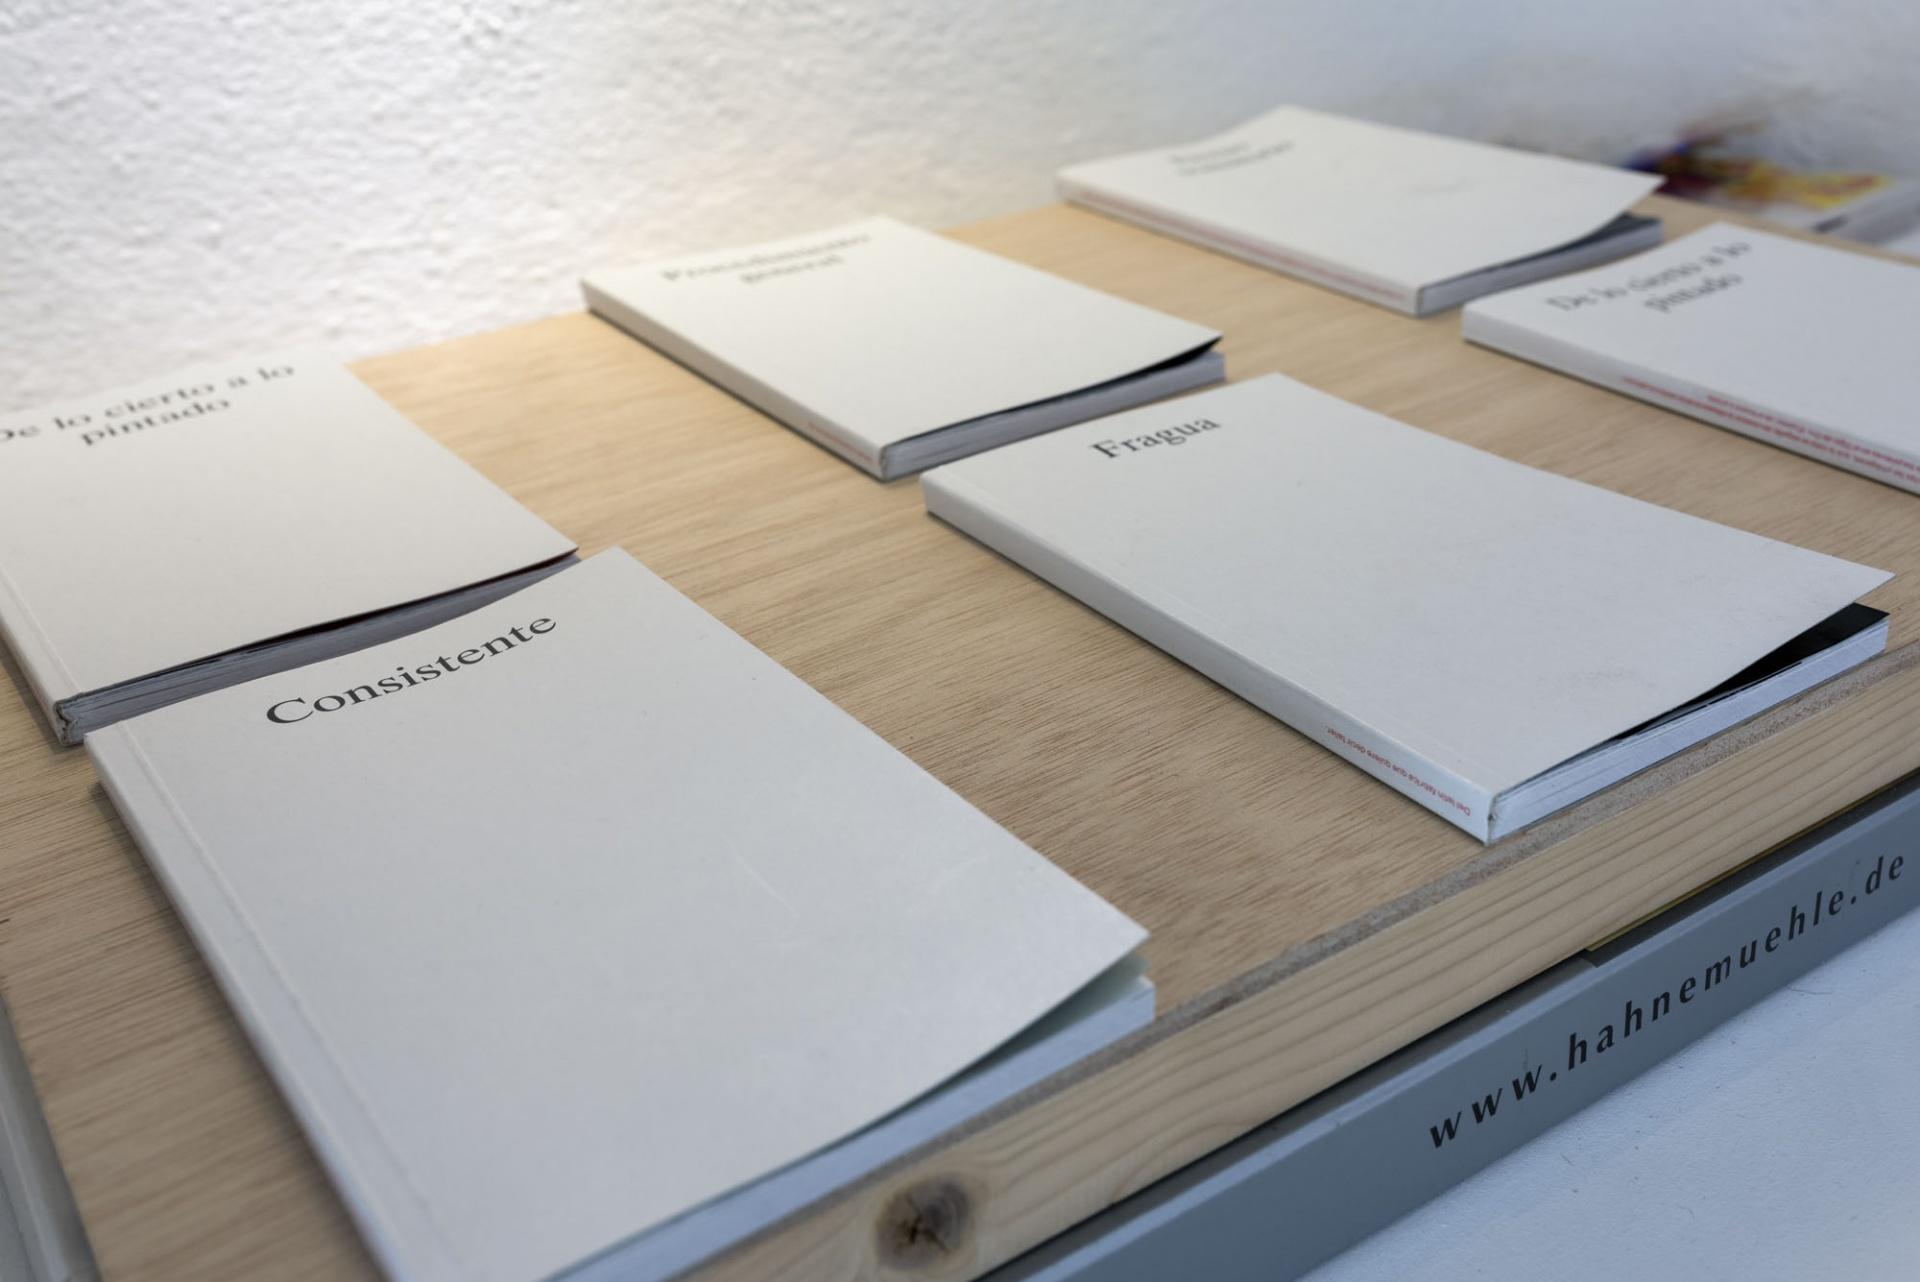 Almanaque/Libro de artista. 3 juegos de 5 libros